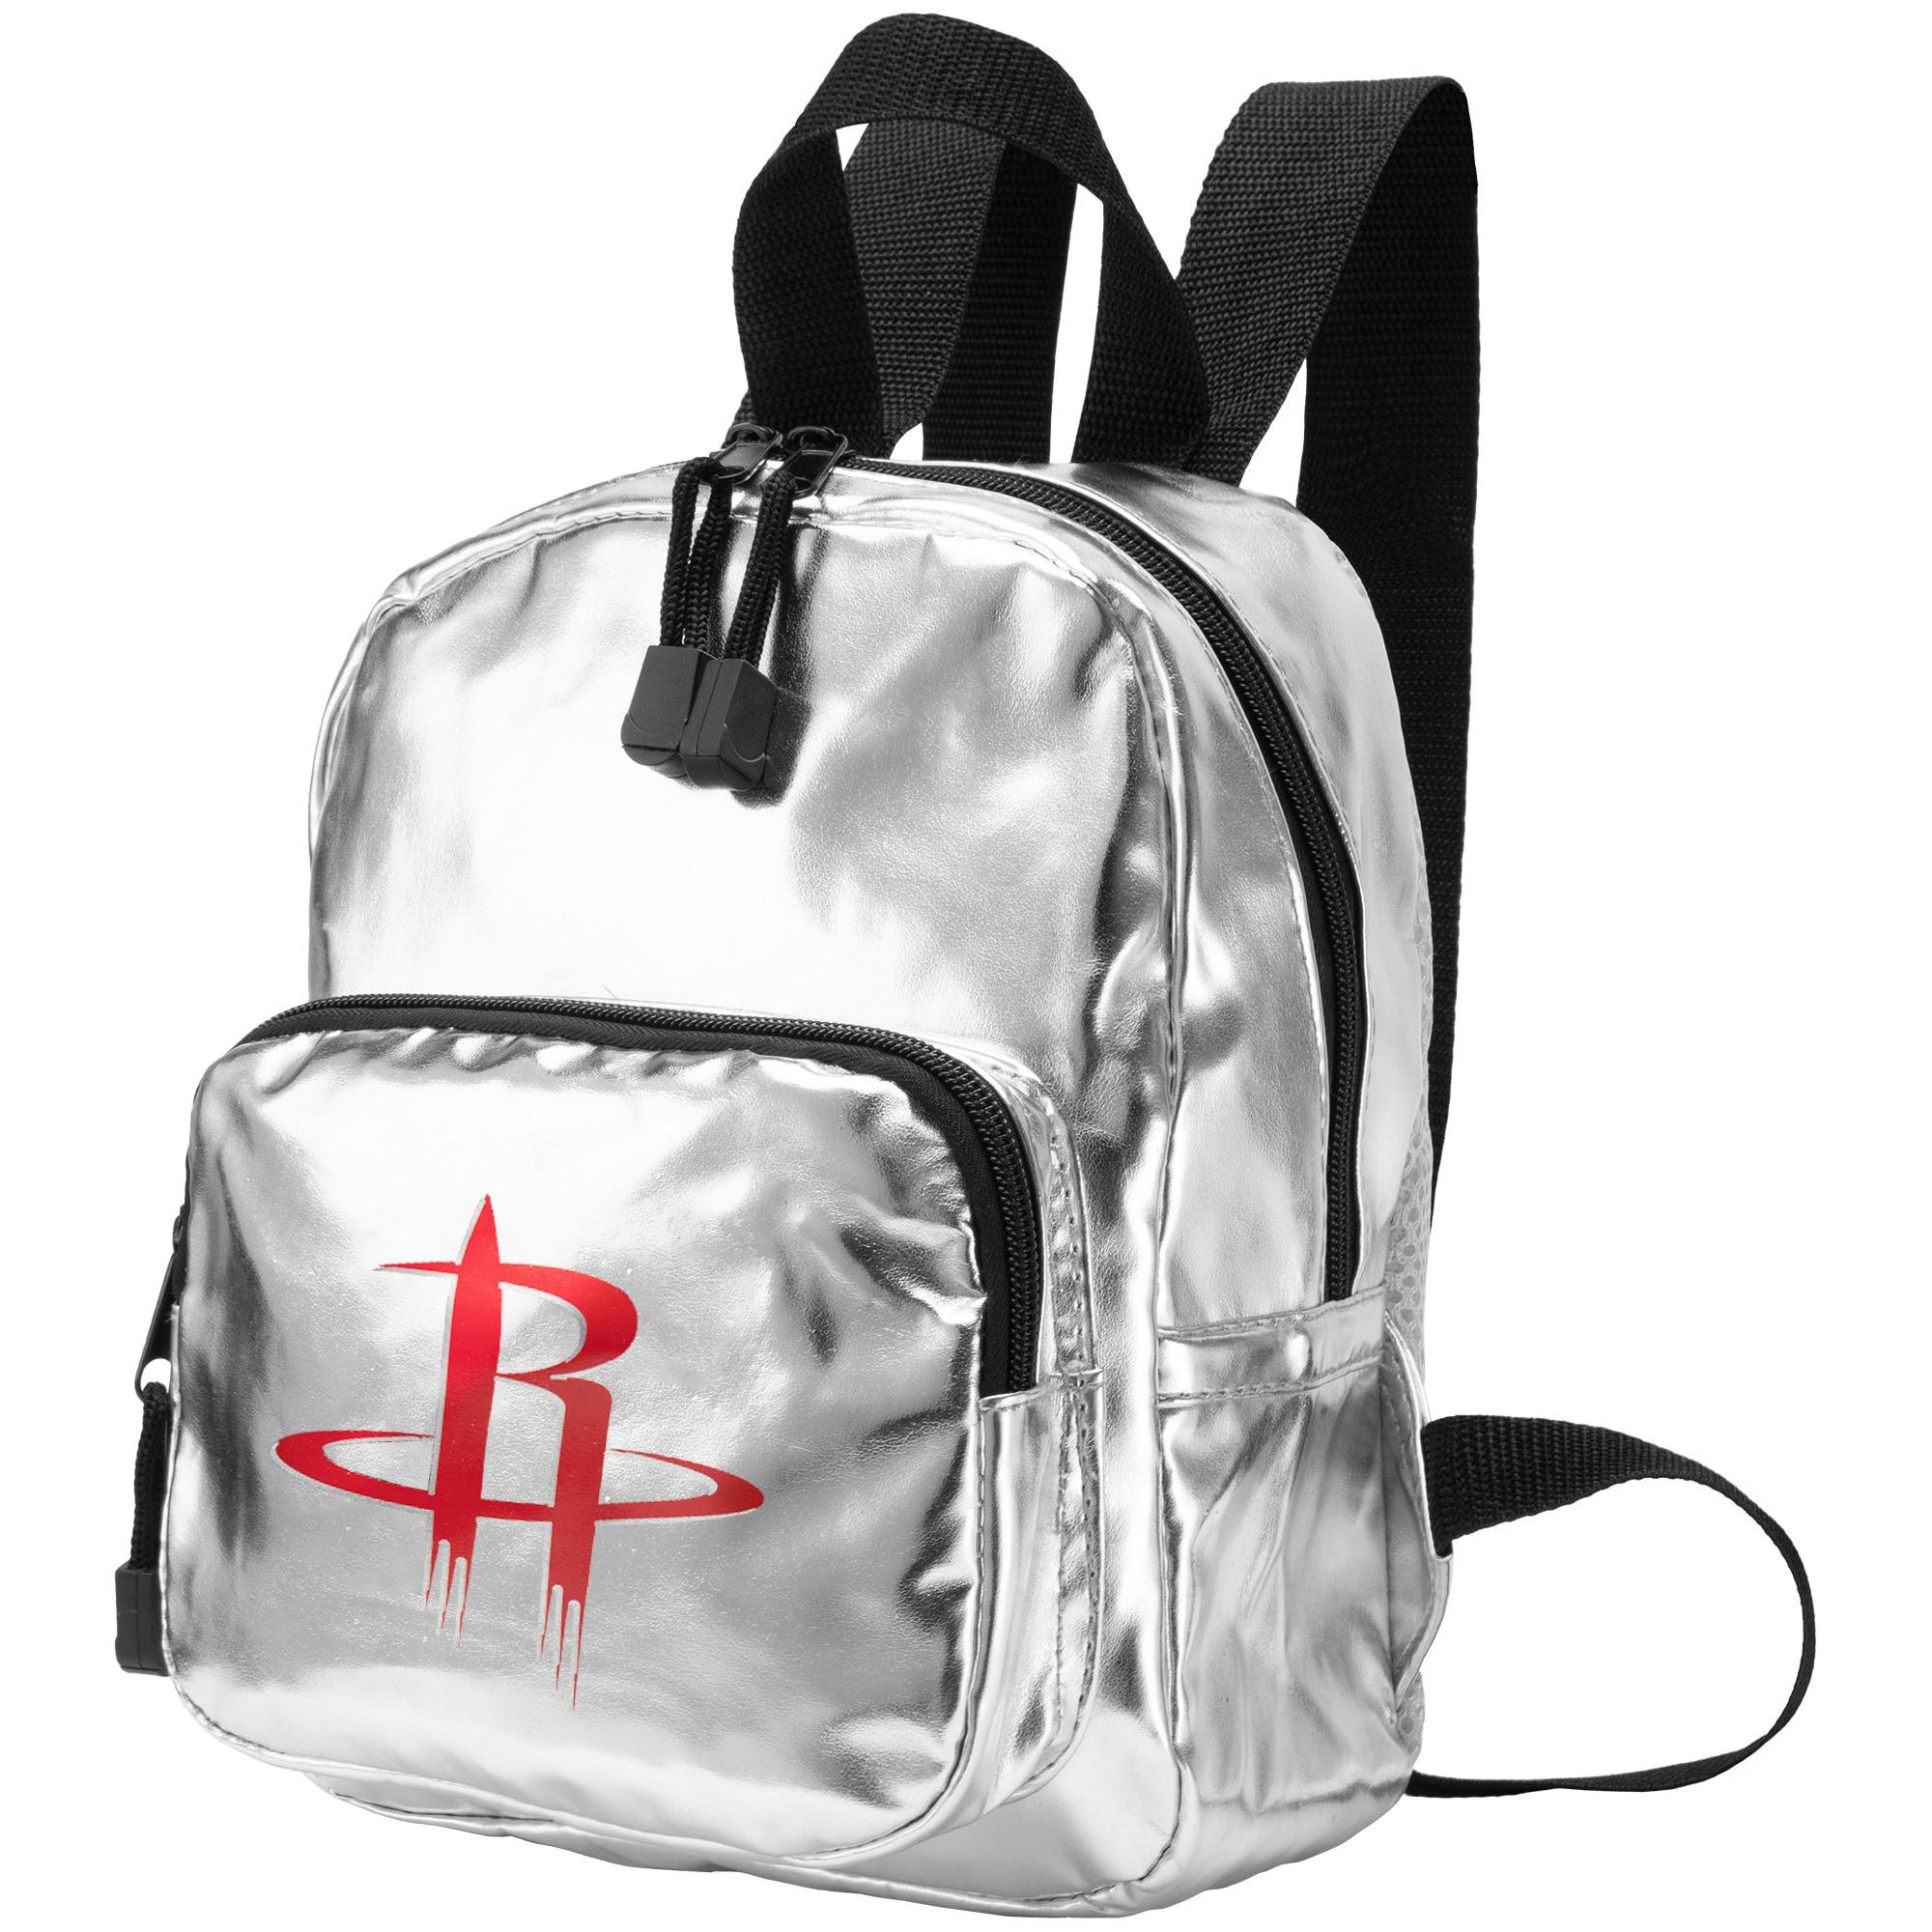 Houston Rockets The Northwest Company Spotlight Mini Backpack